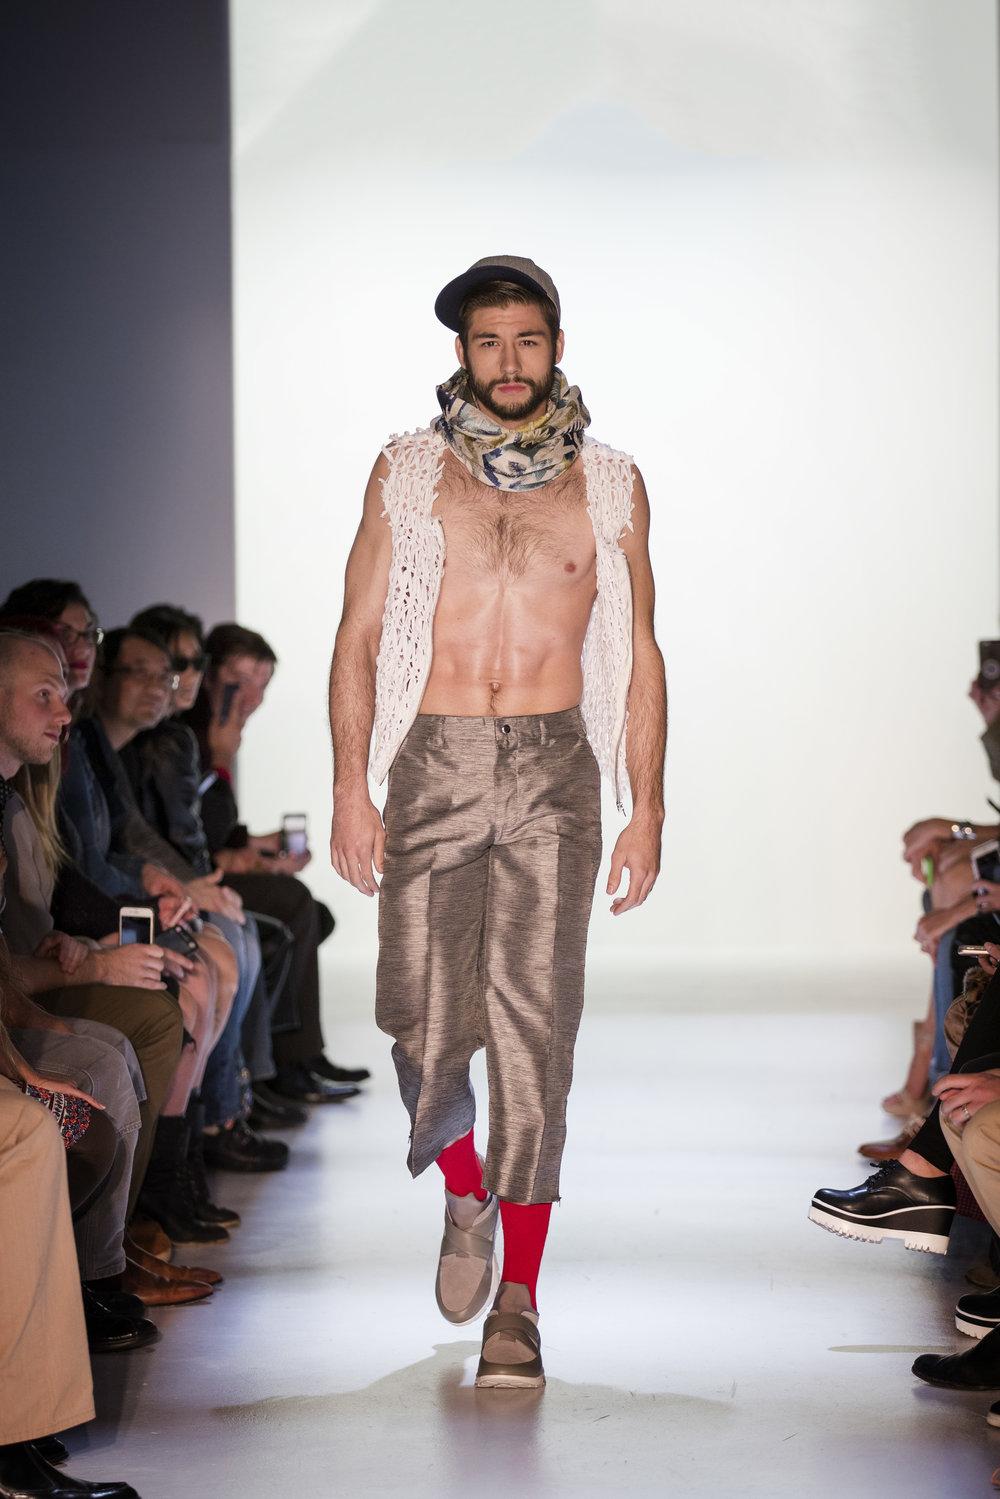 Massif Fashion Week 2017 Day 4 GIA New York Guillermo Irias - 007.jpg